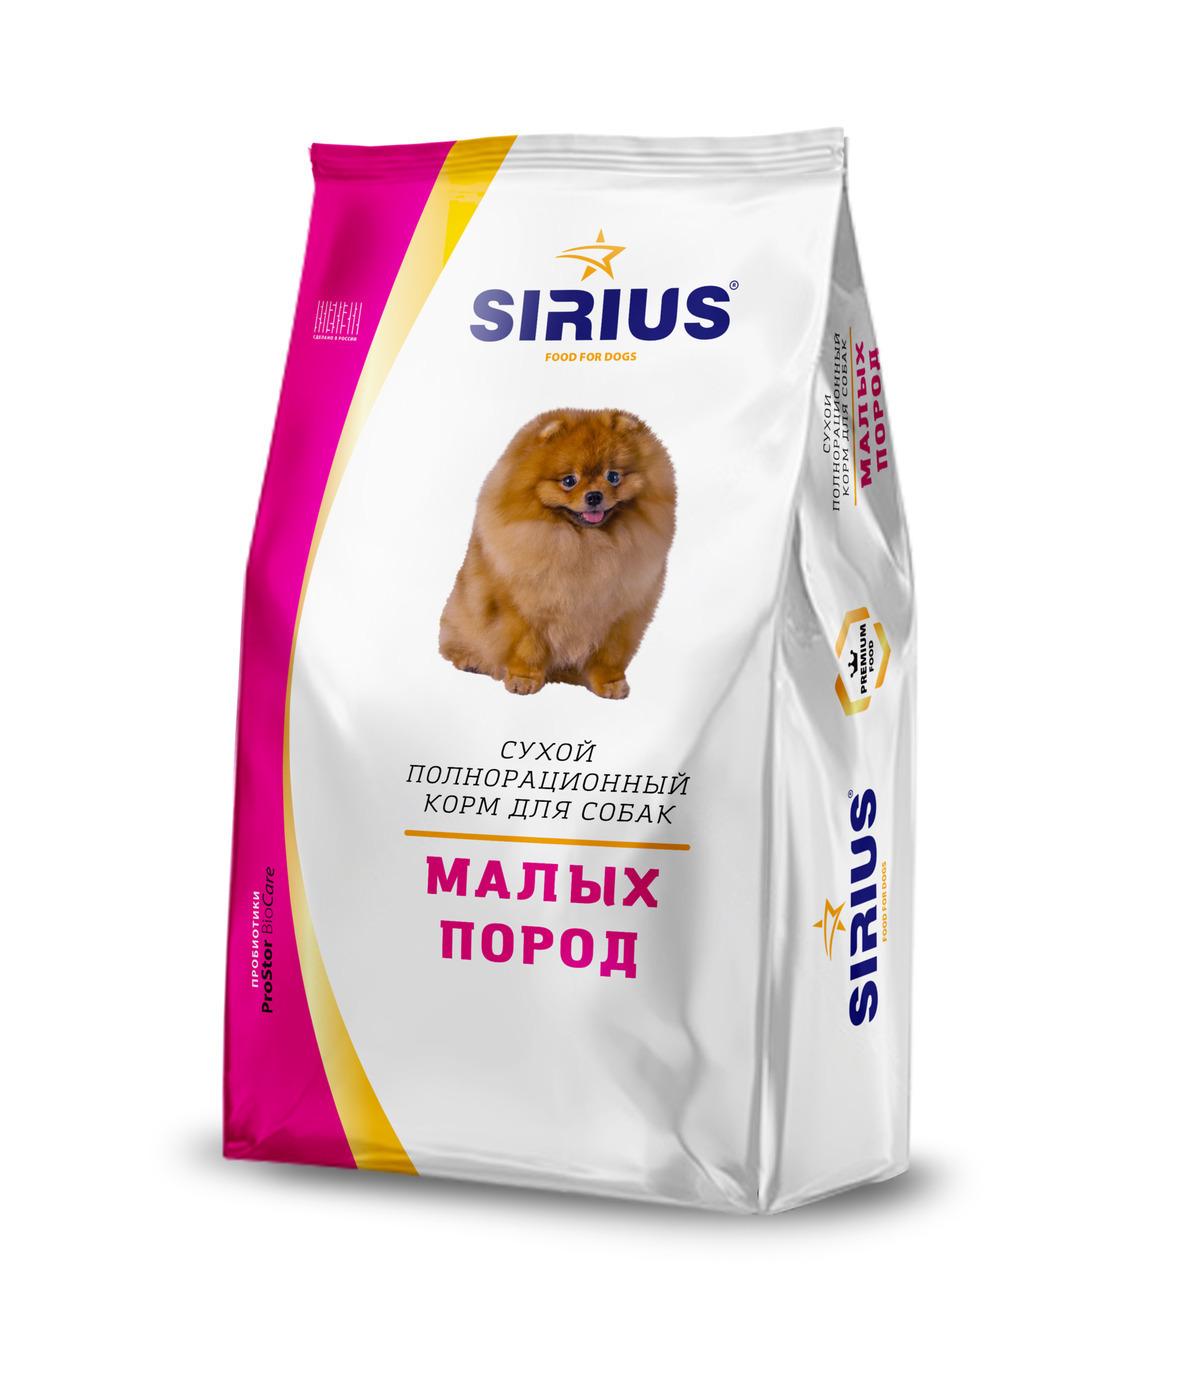 Сухой корм ТМ «SIRIUS» для взрослых собак мелких пород, 1,2